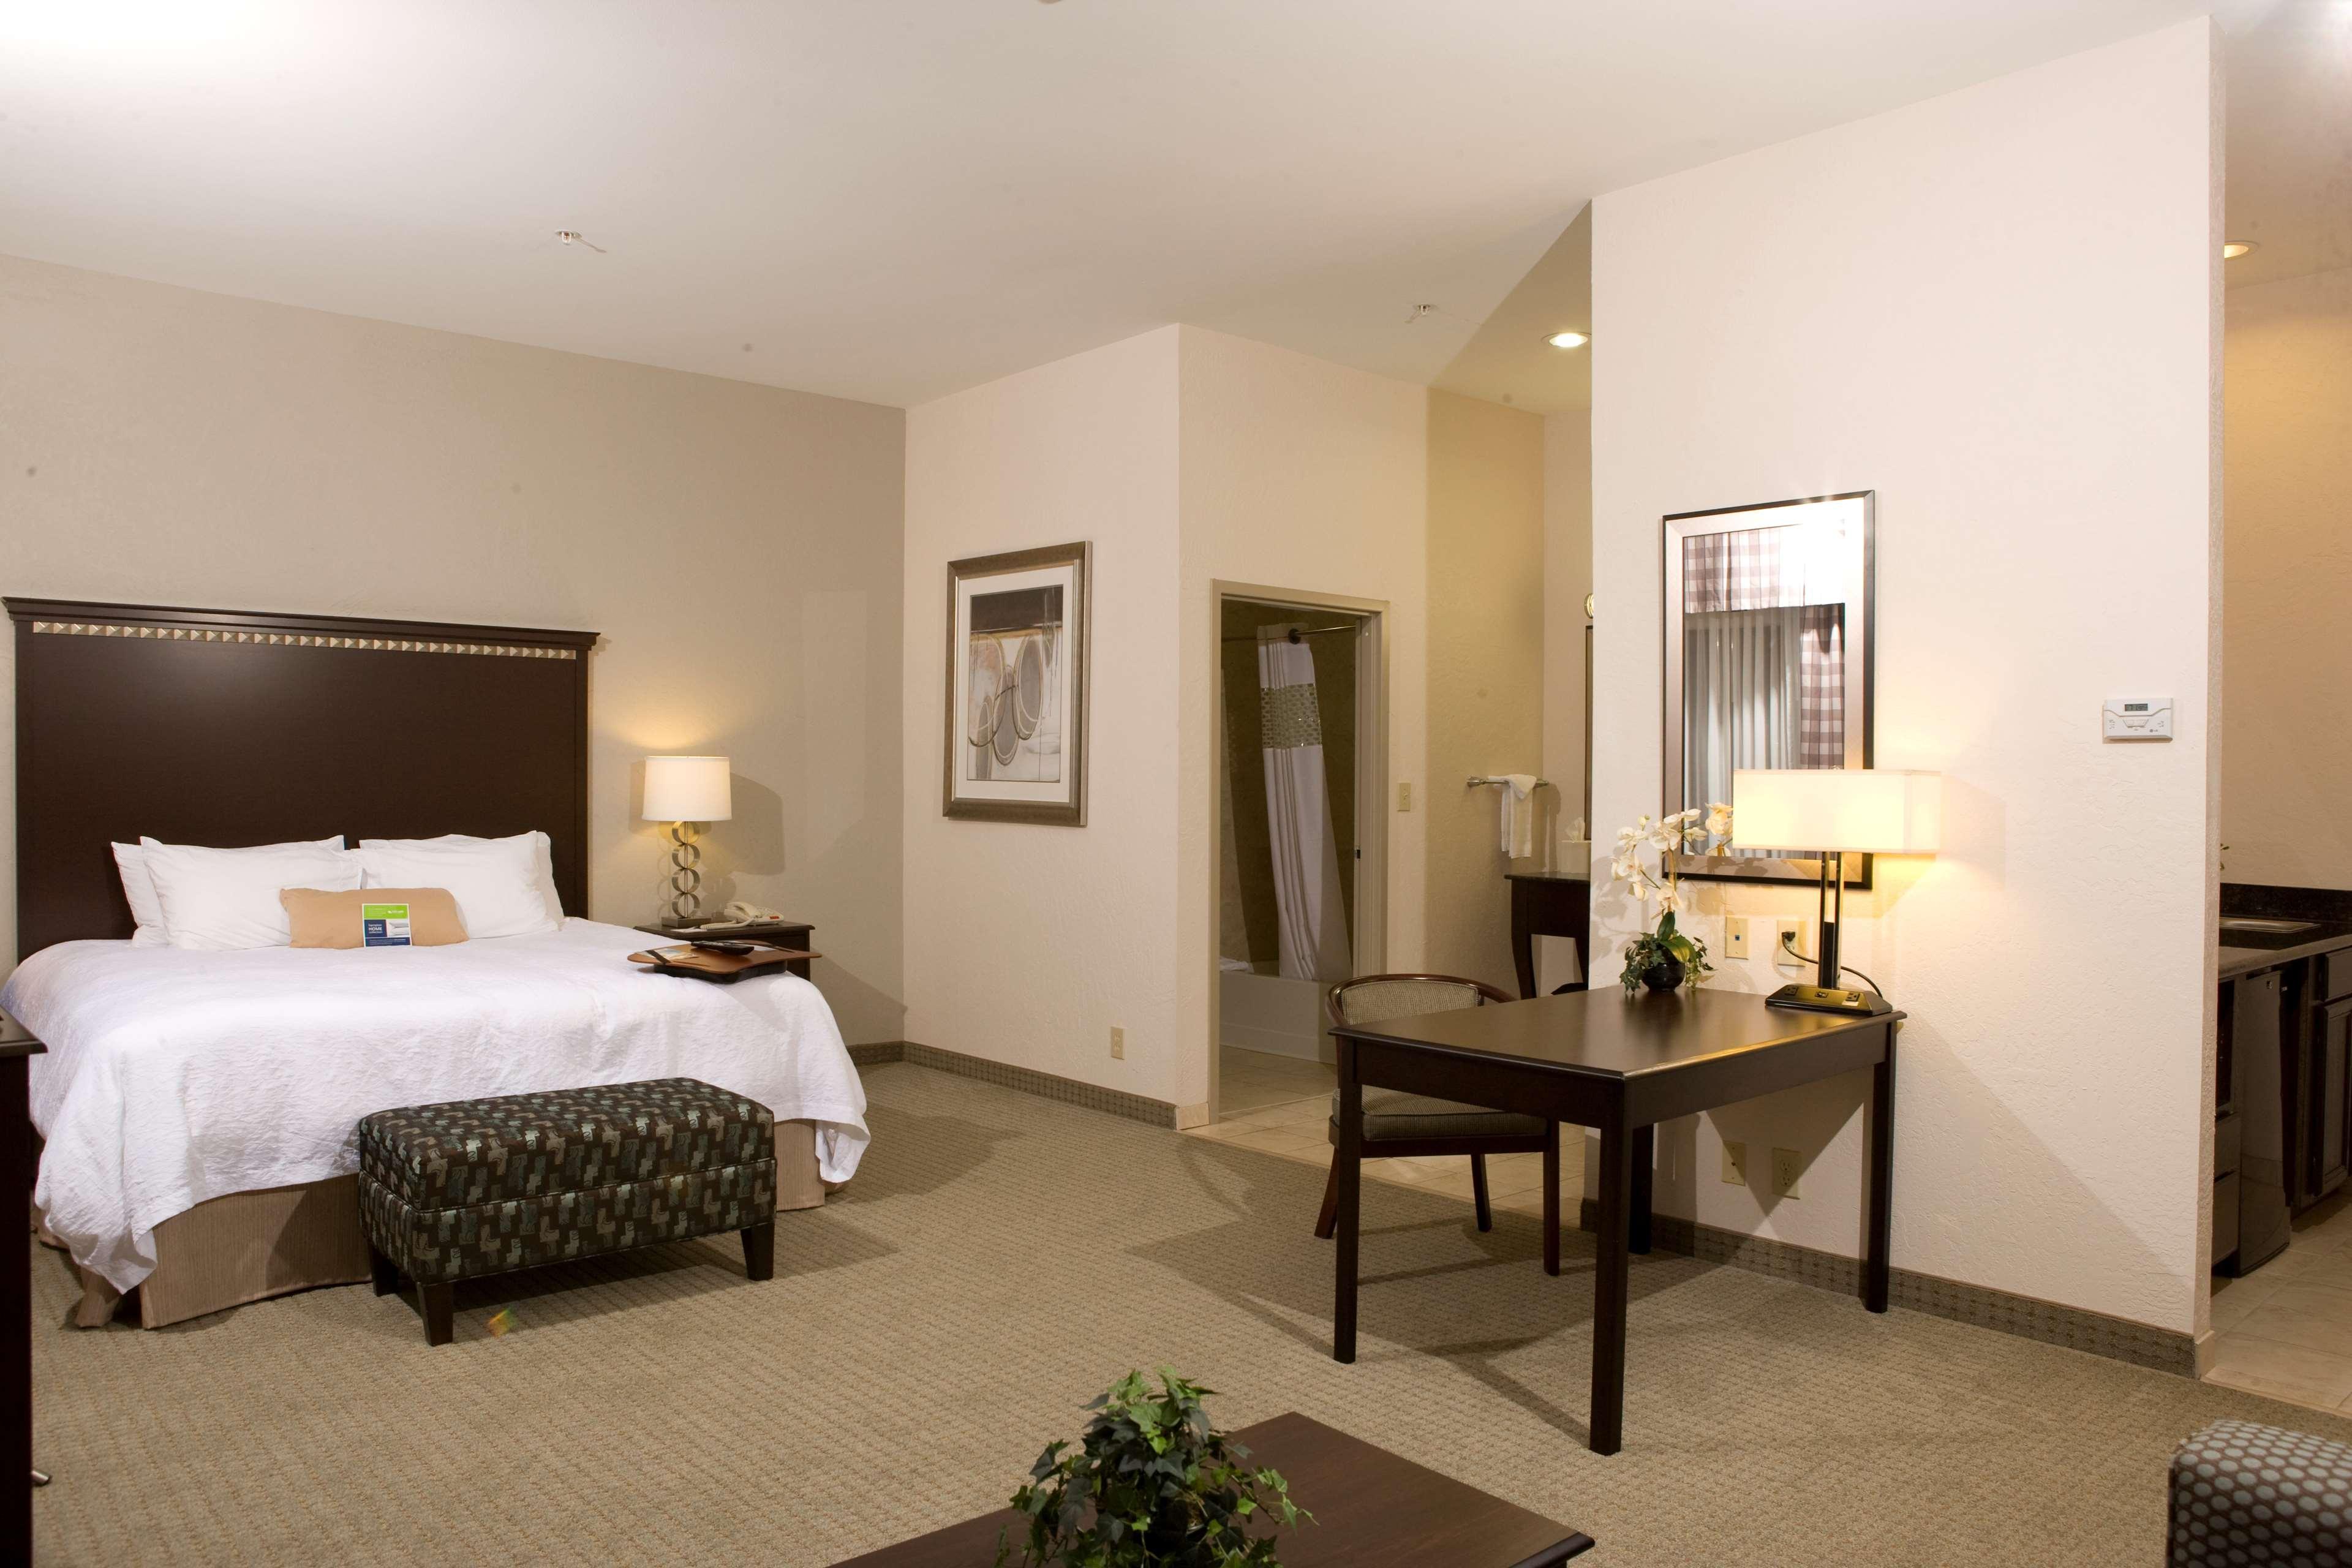 Hampton Inn & Suites Mount Pleasant image 20